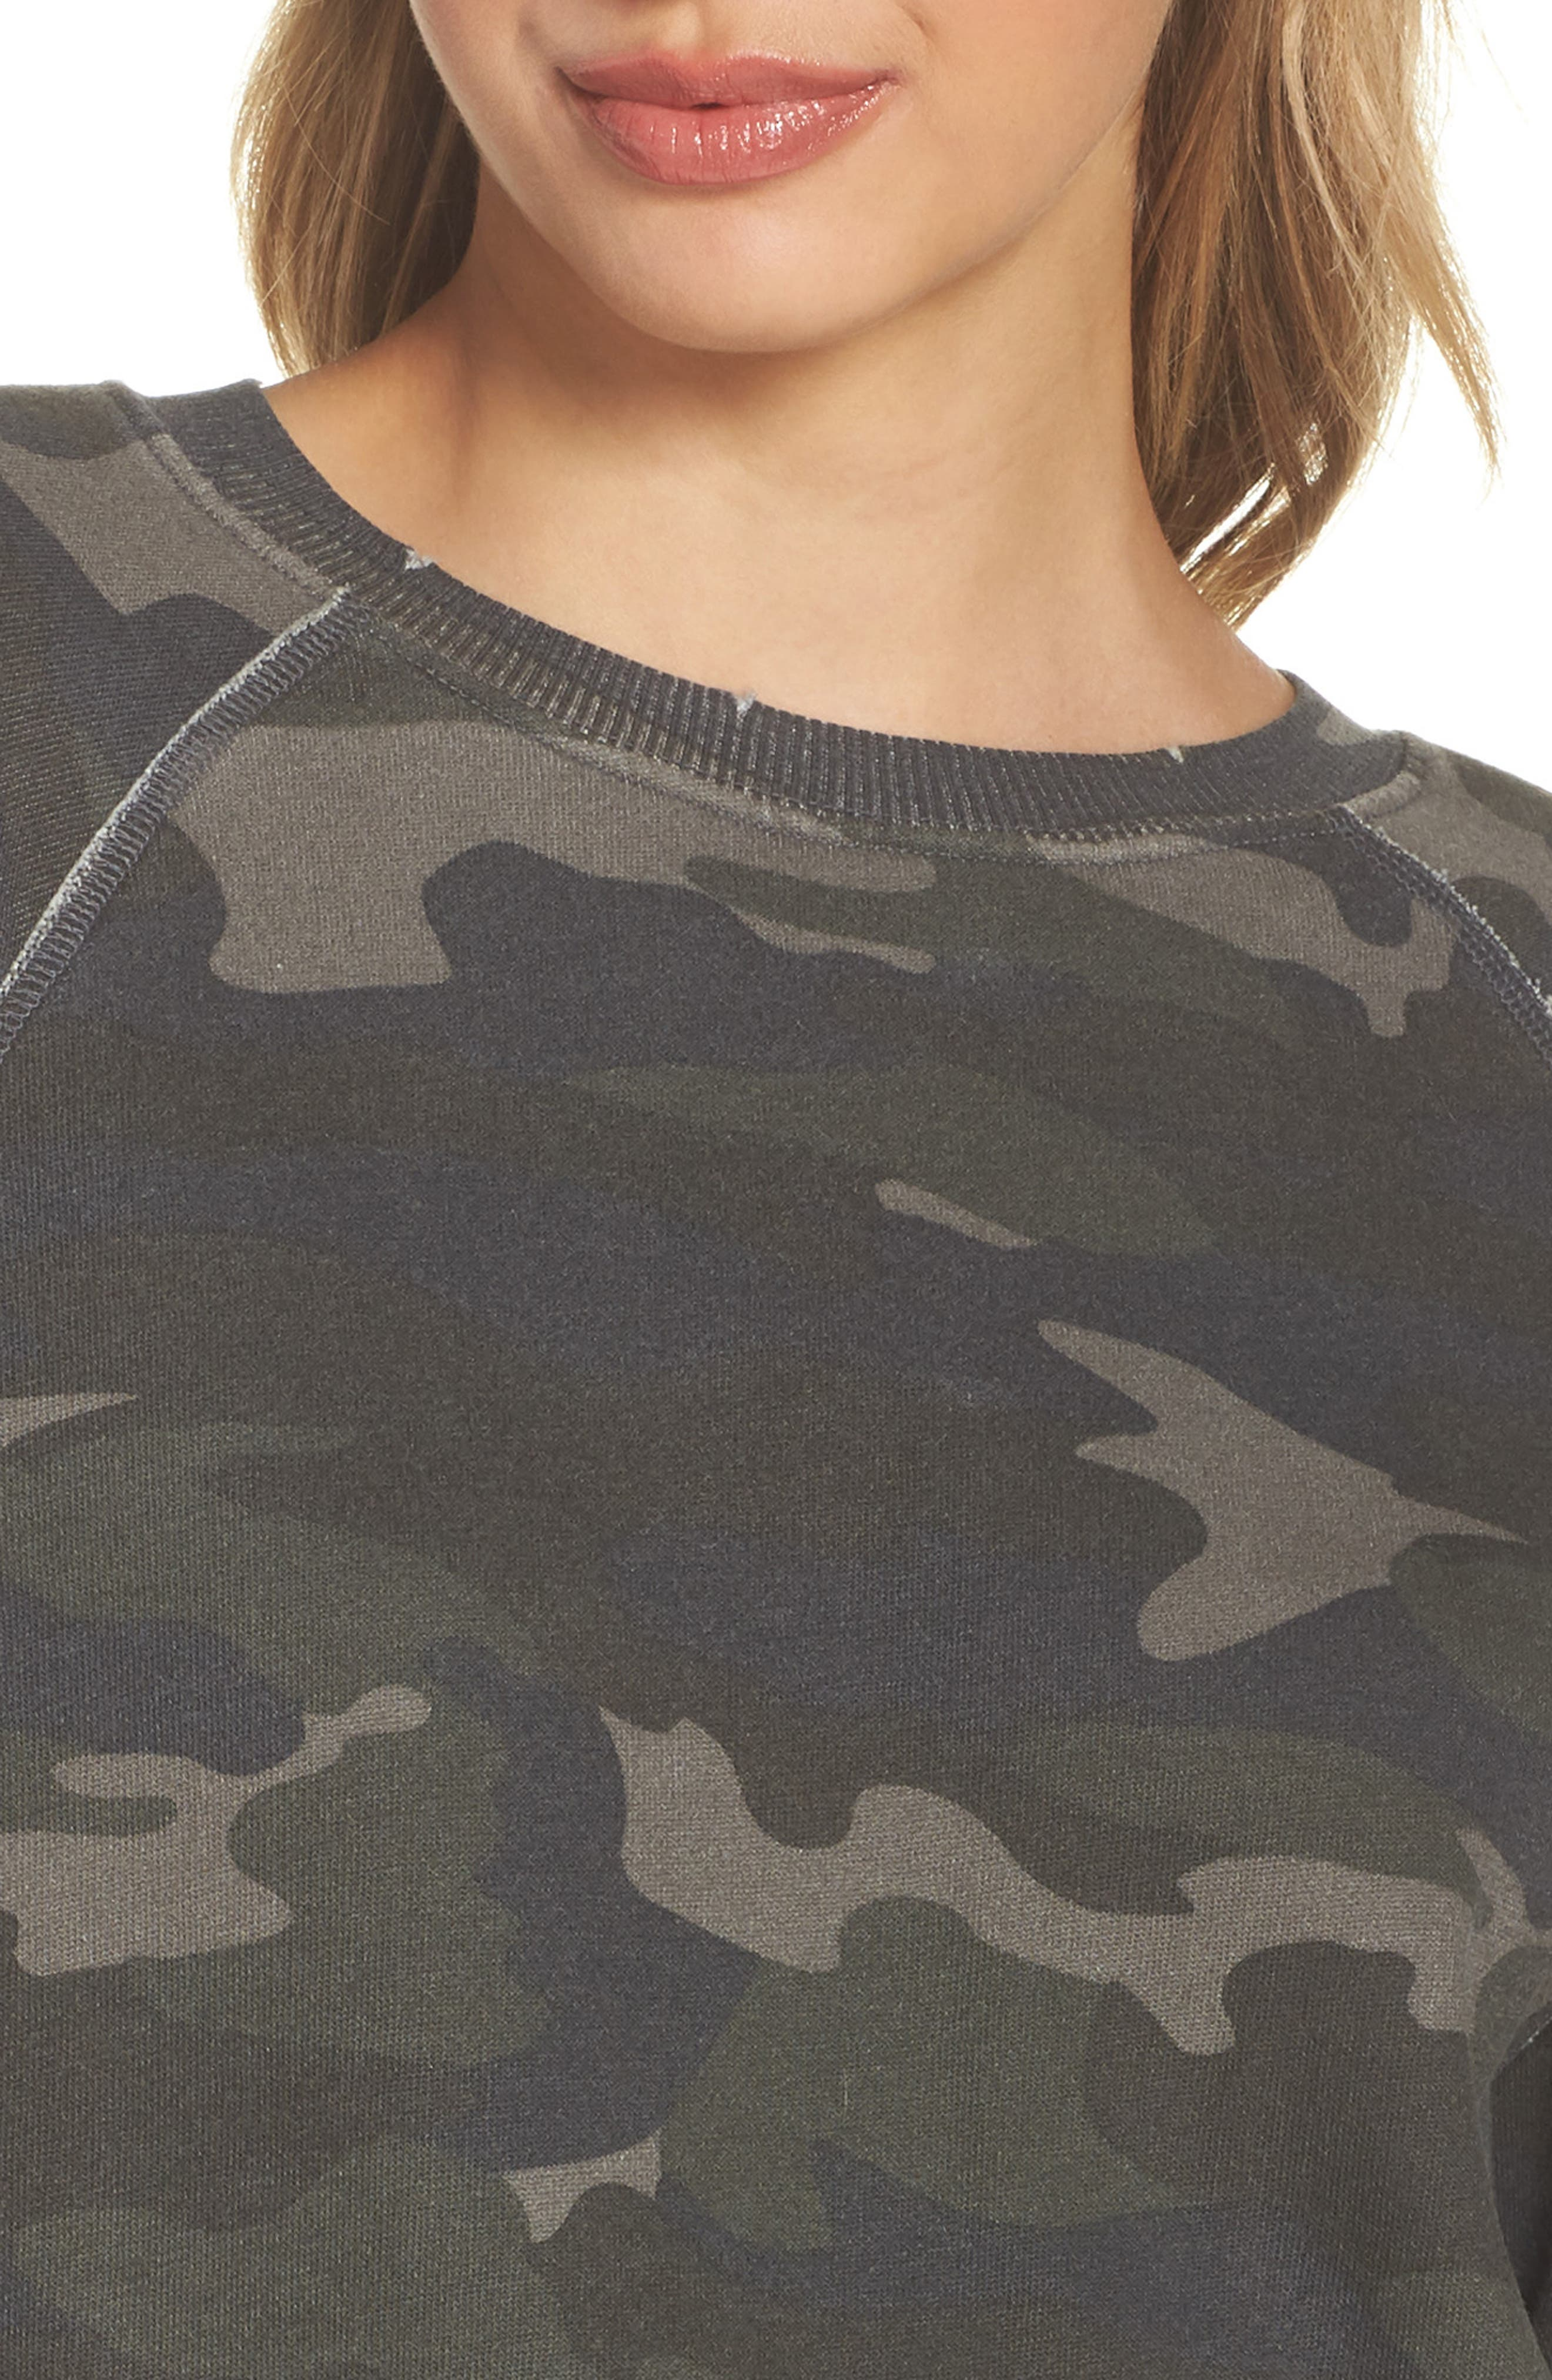 RAGDOLL, Camo Oversize Sweatshirt, Alternate thumbnail 4, color, CAMO